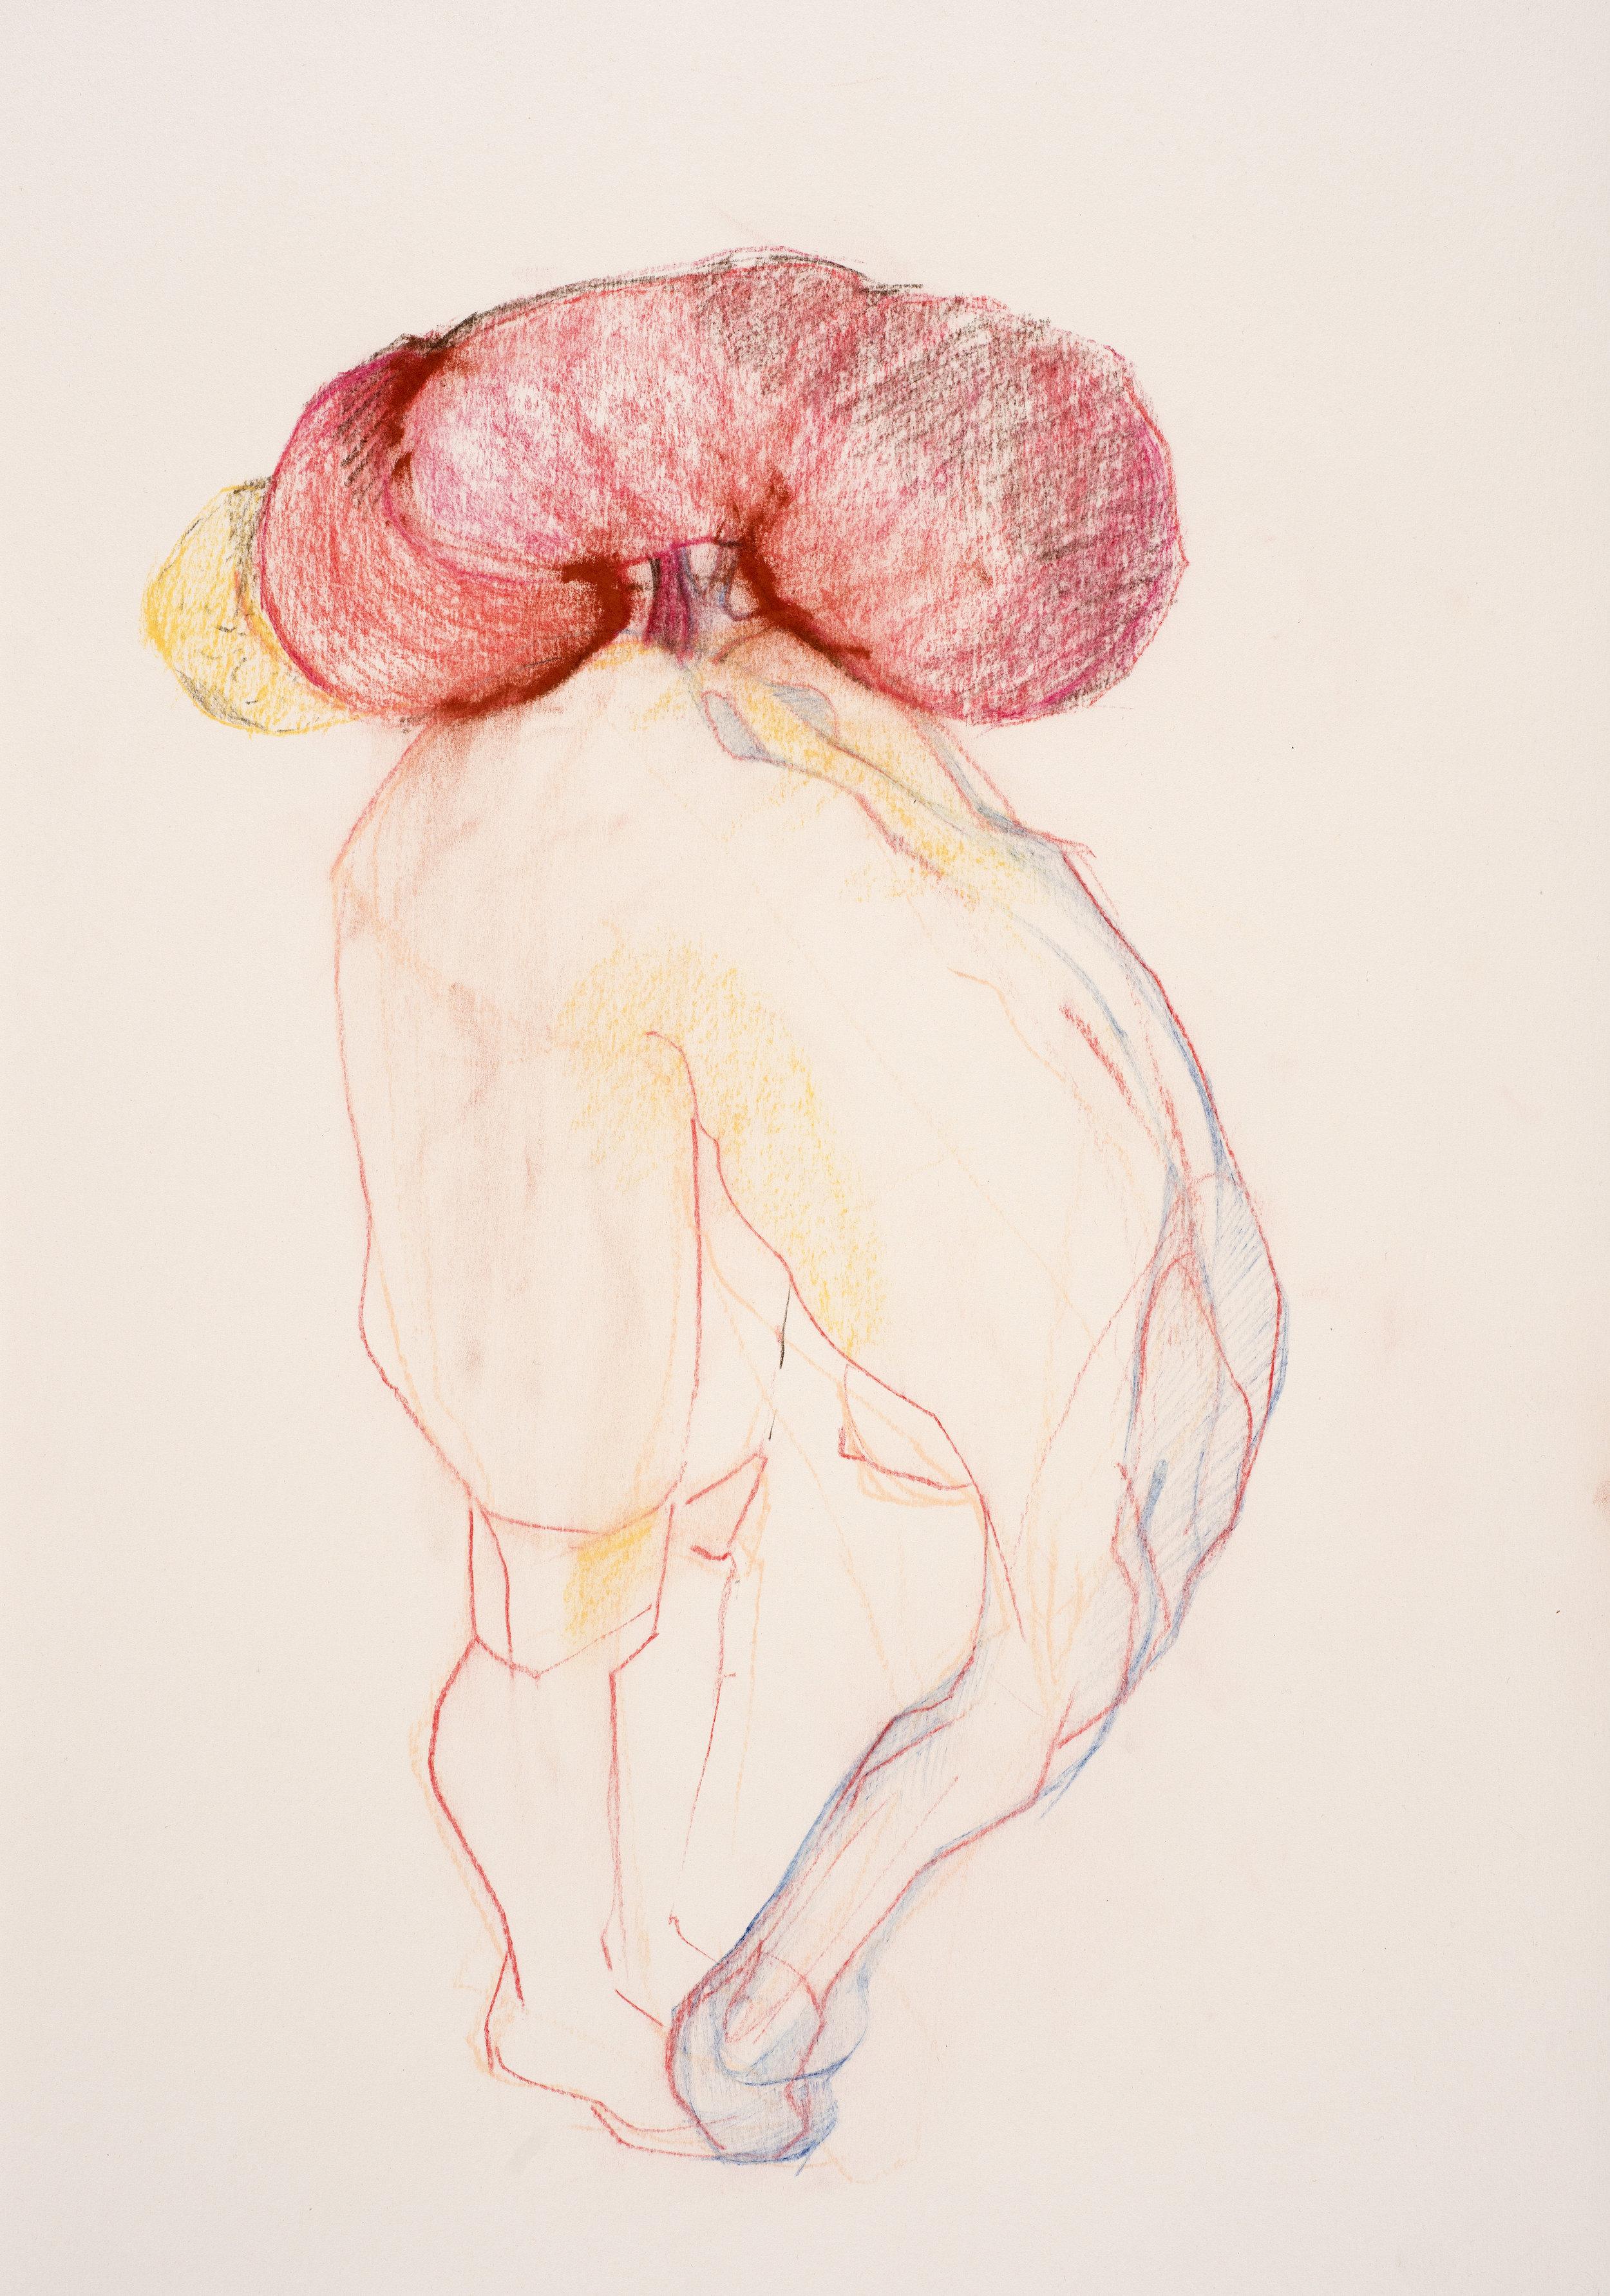 pastel on paper  35 x 49.6cm